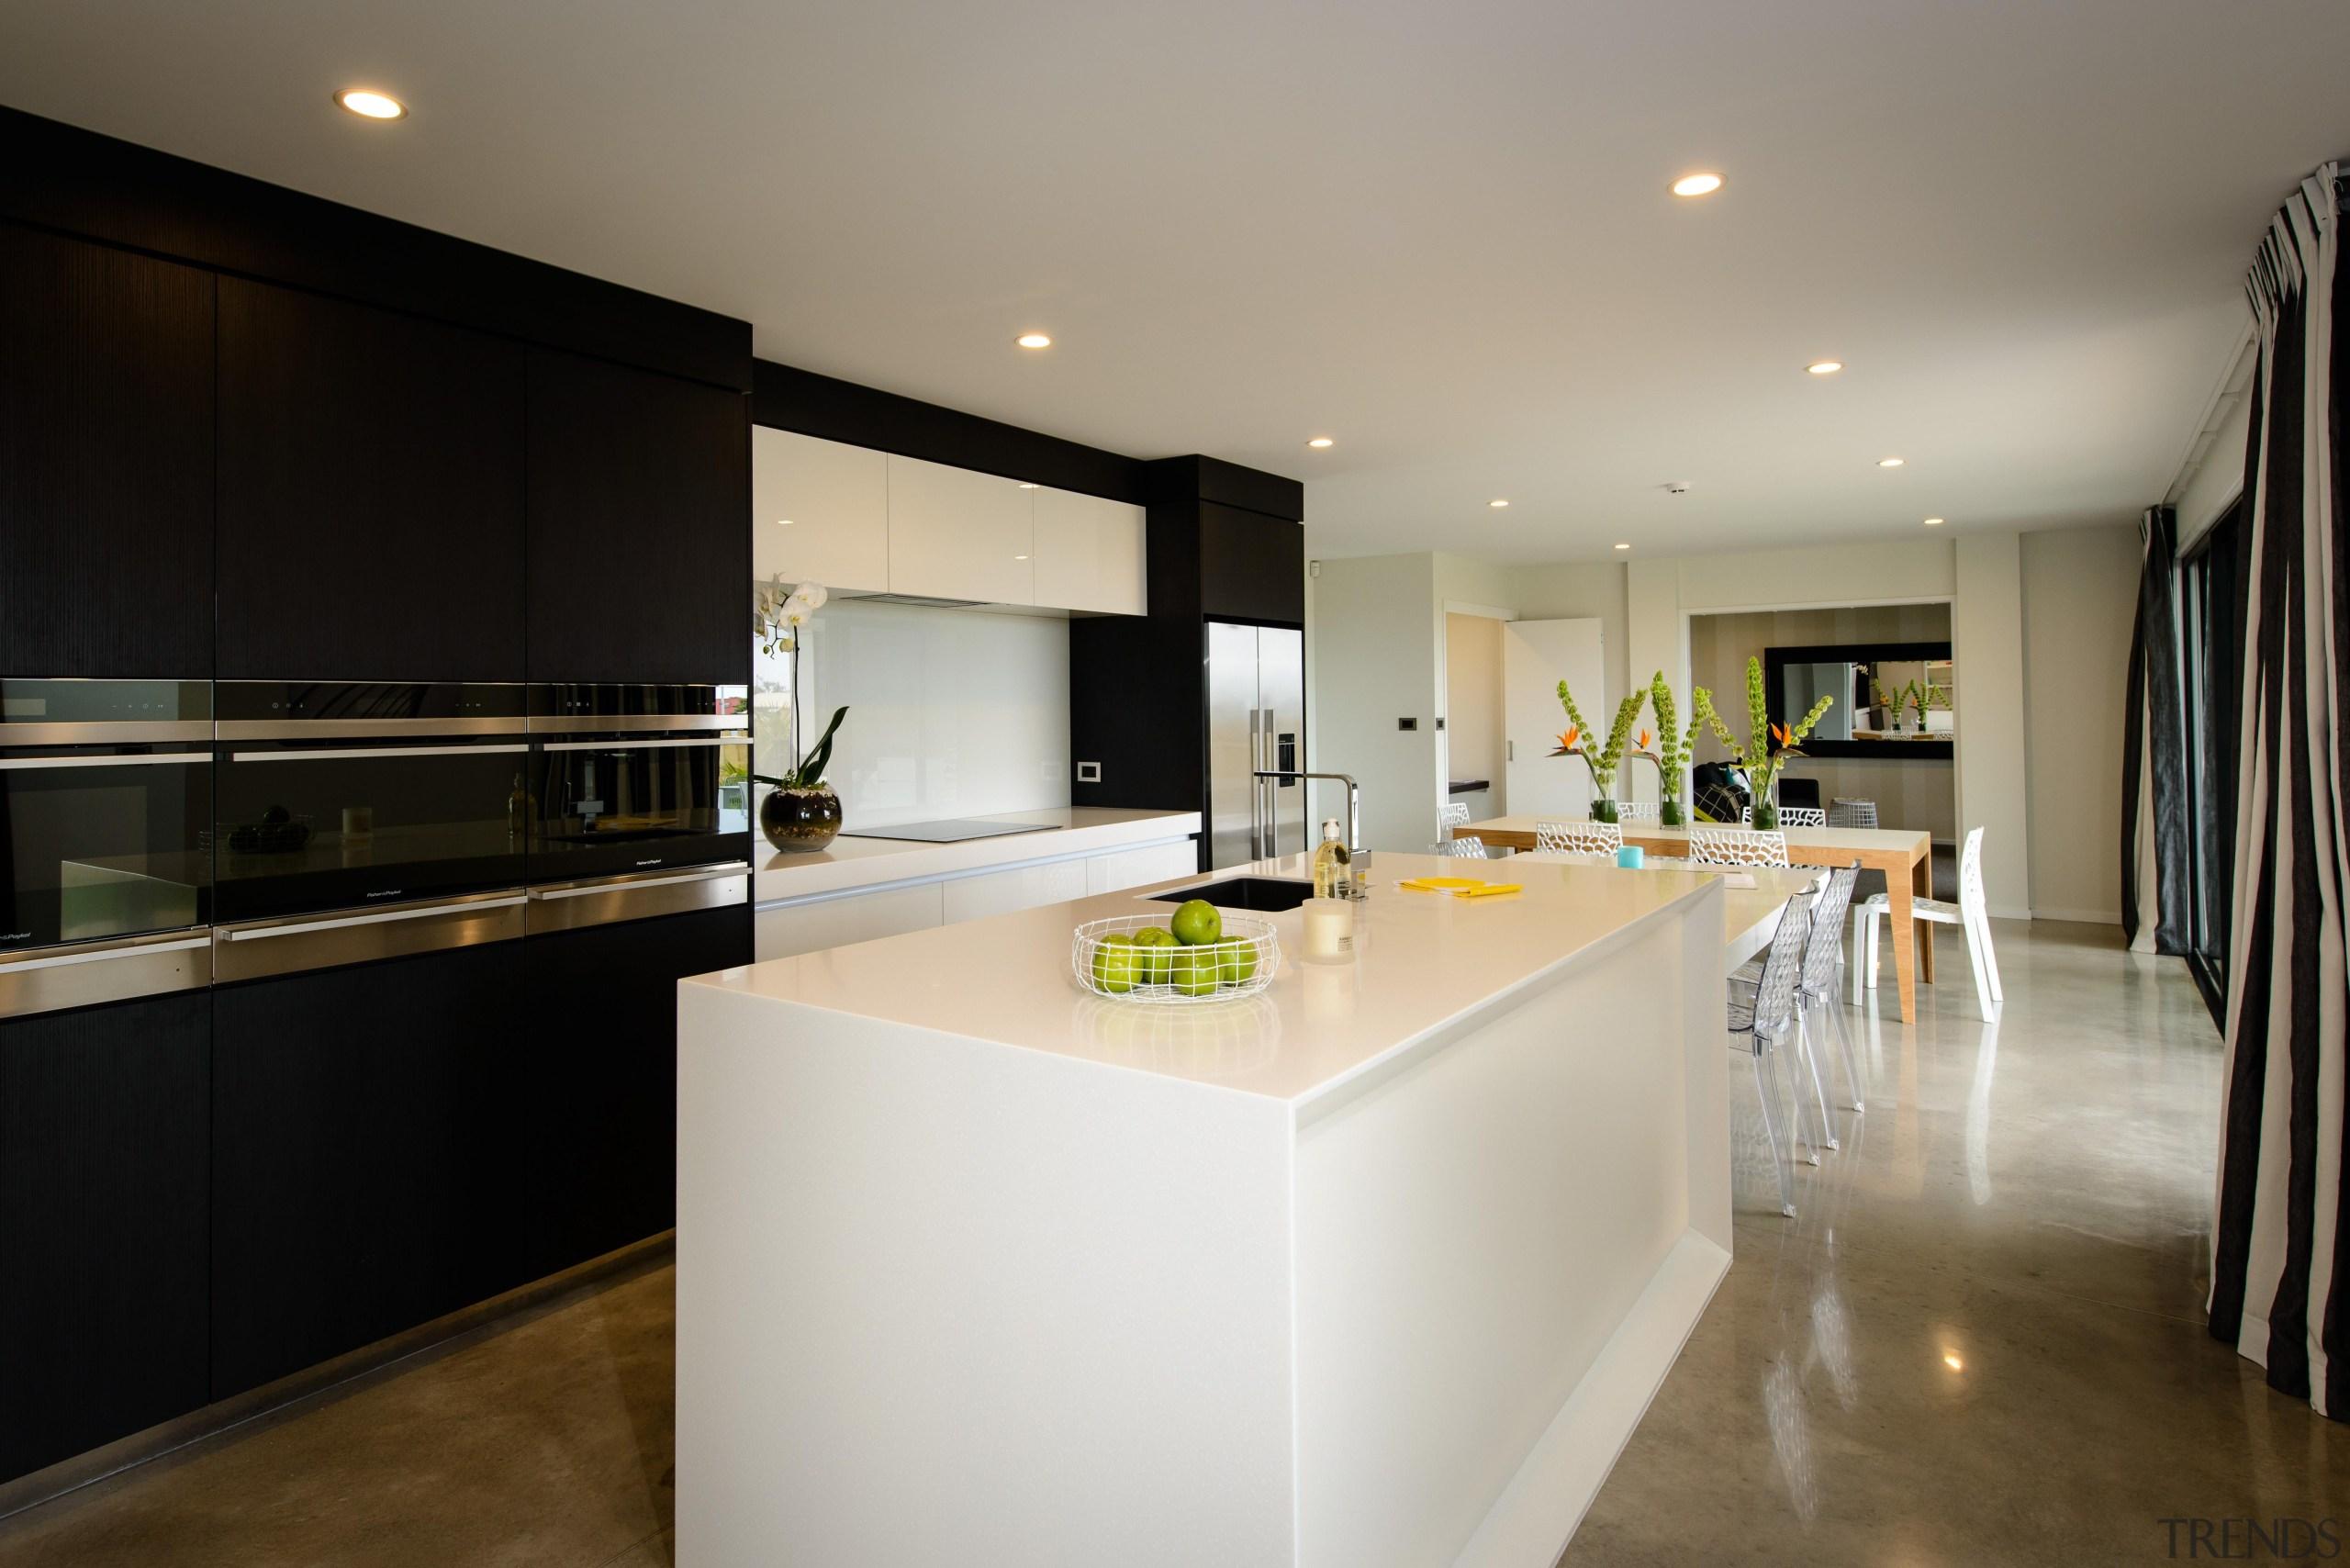 Modern showhome in TaranakiFor more information, please visit apartment, architecture, countertop, cuisine classique, house, interior design, kitchen, real estate, room, gray, black